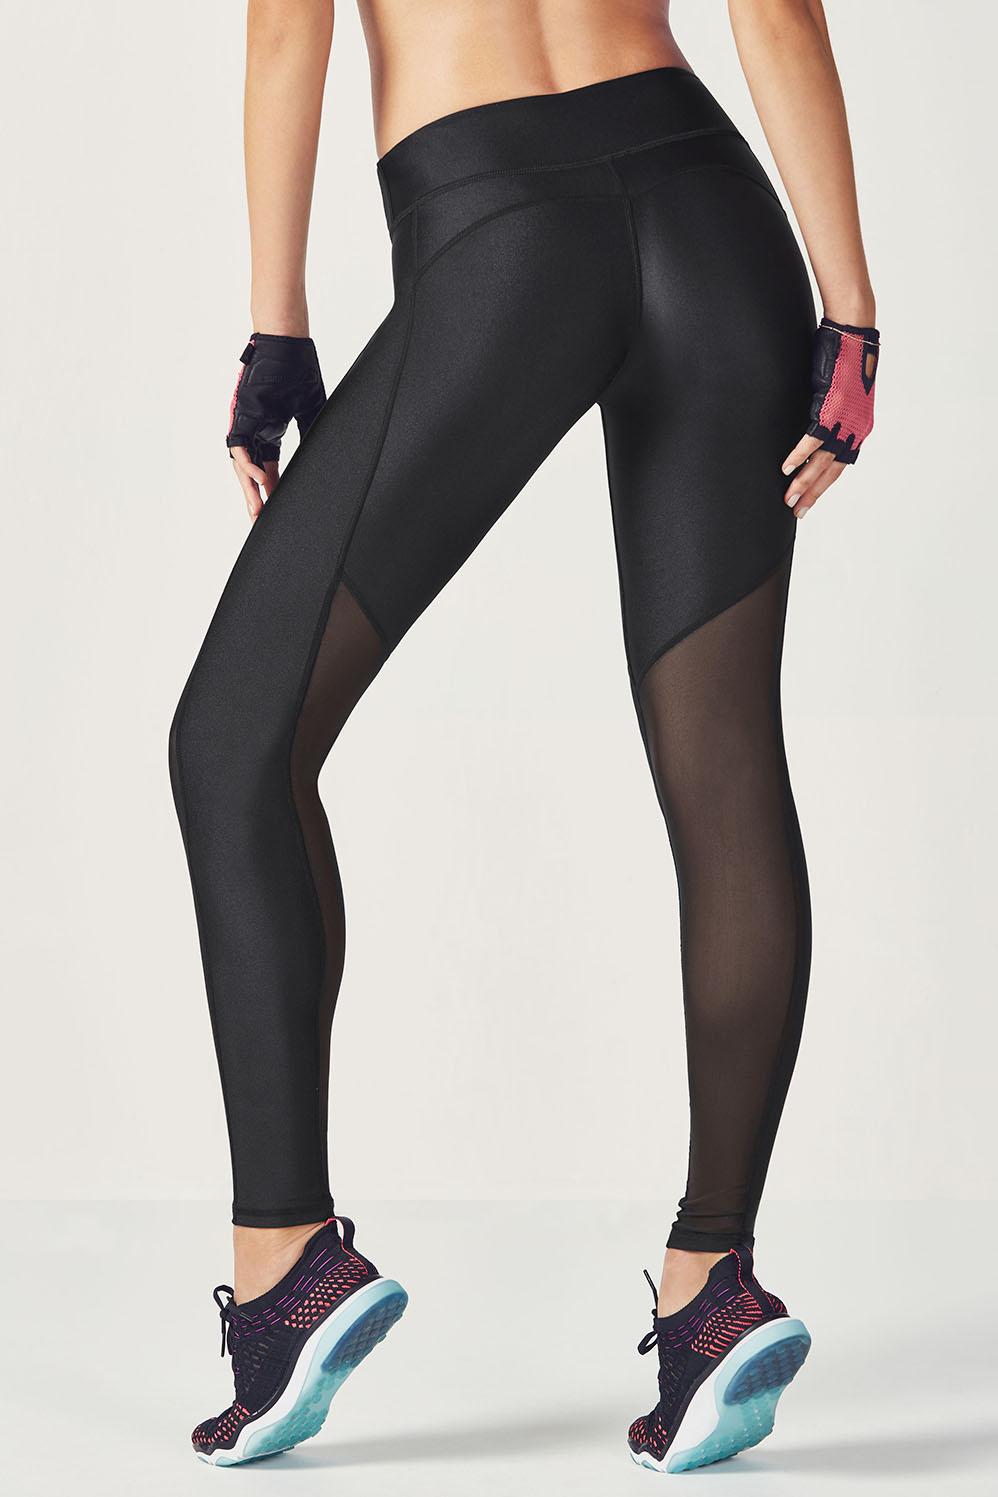 Fabletics Tight Rocha Shine Legging Womens Black Size L